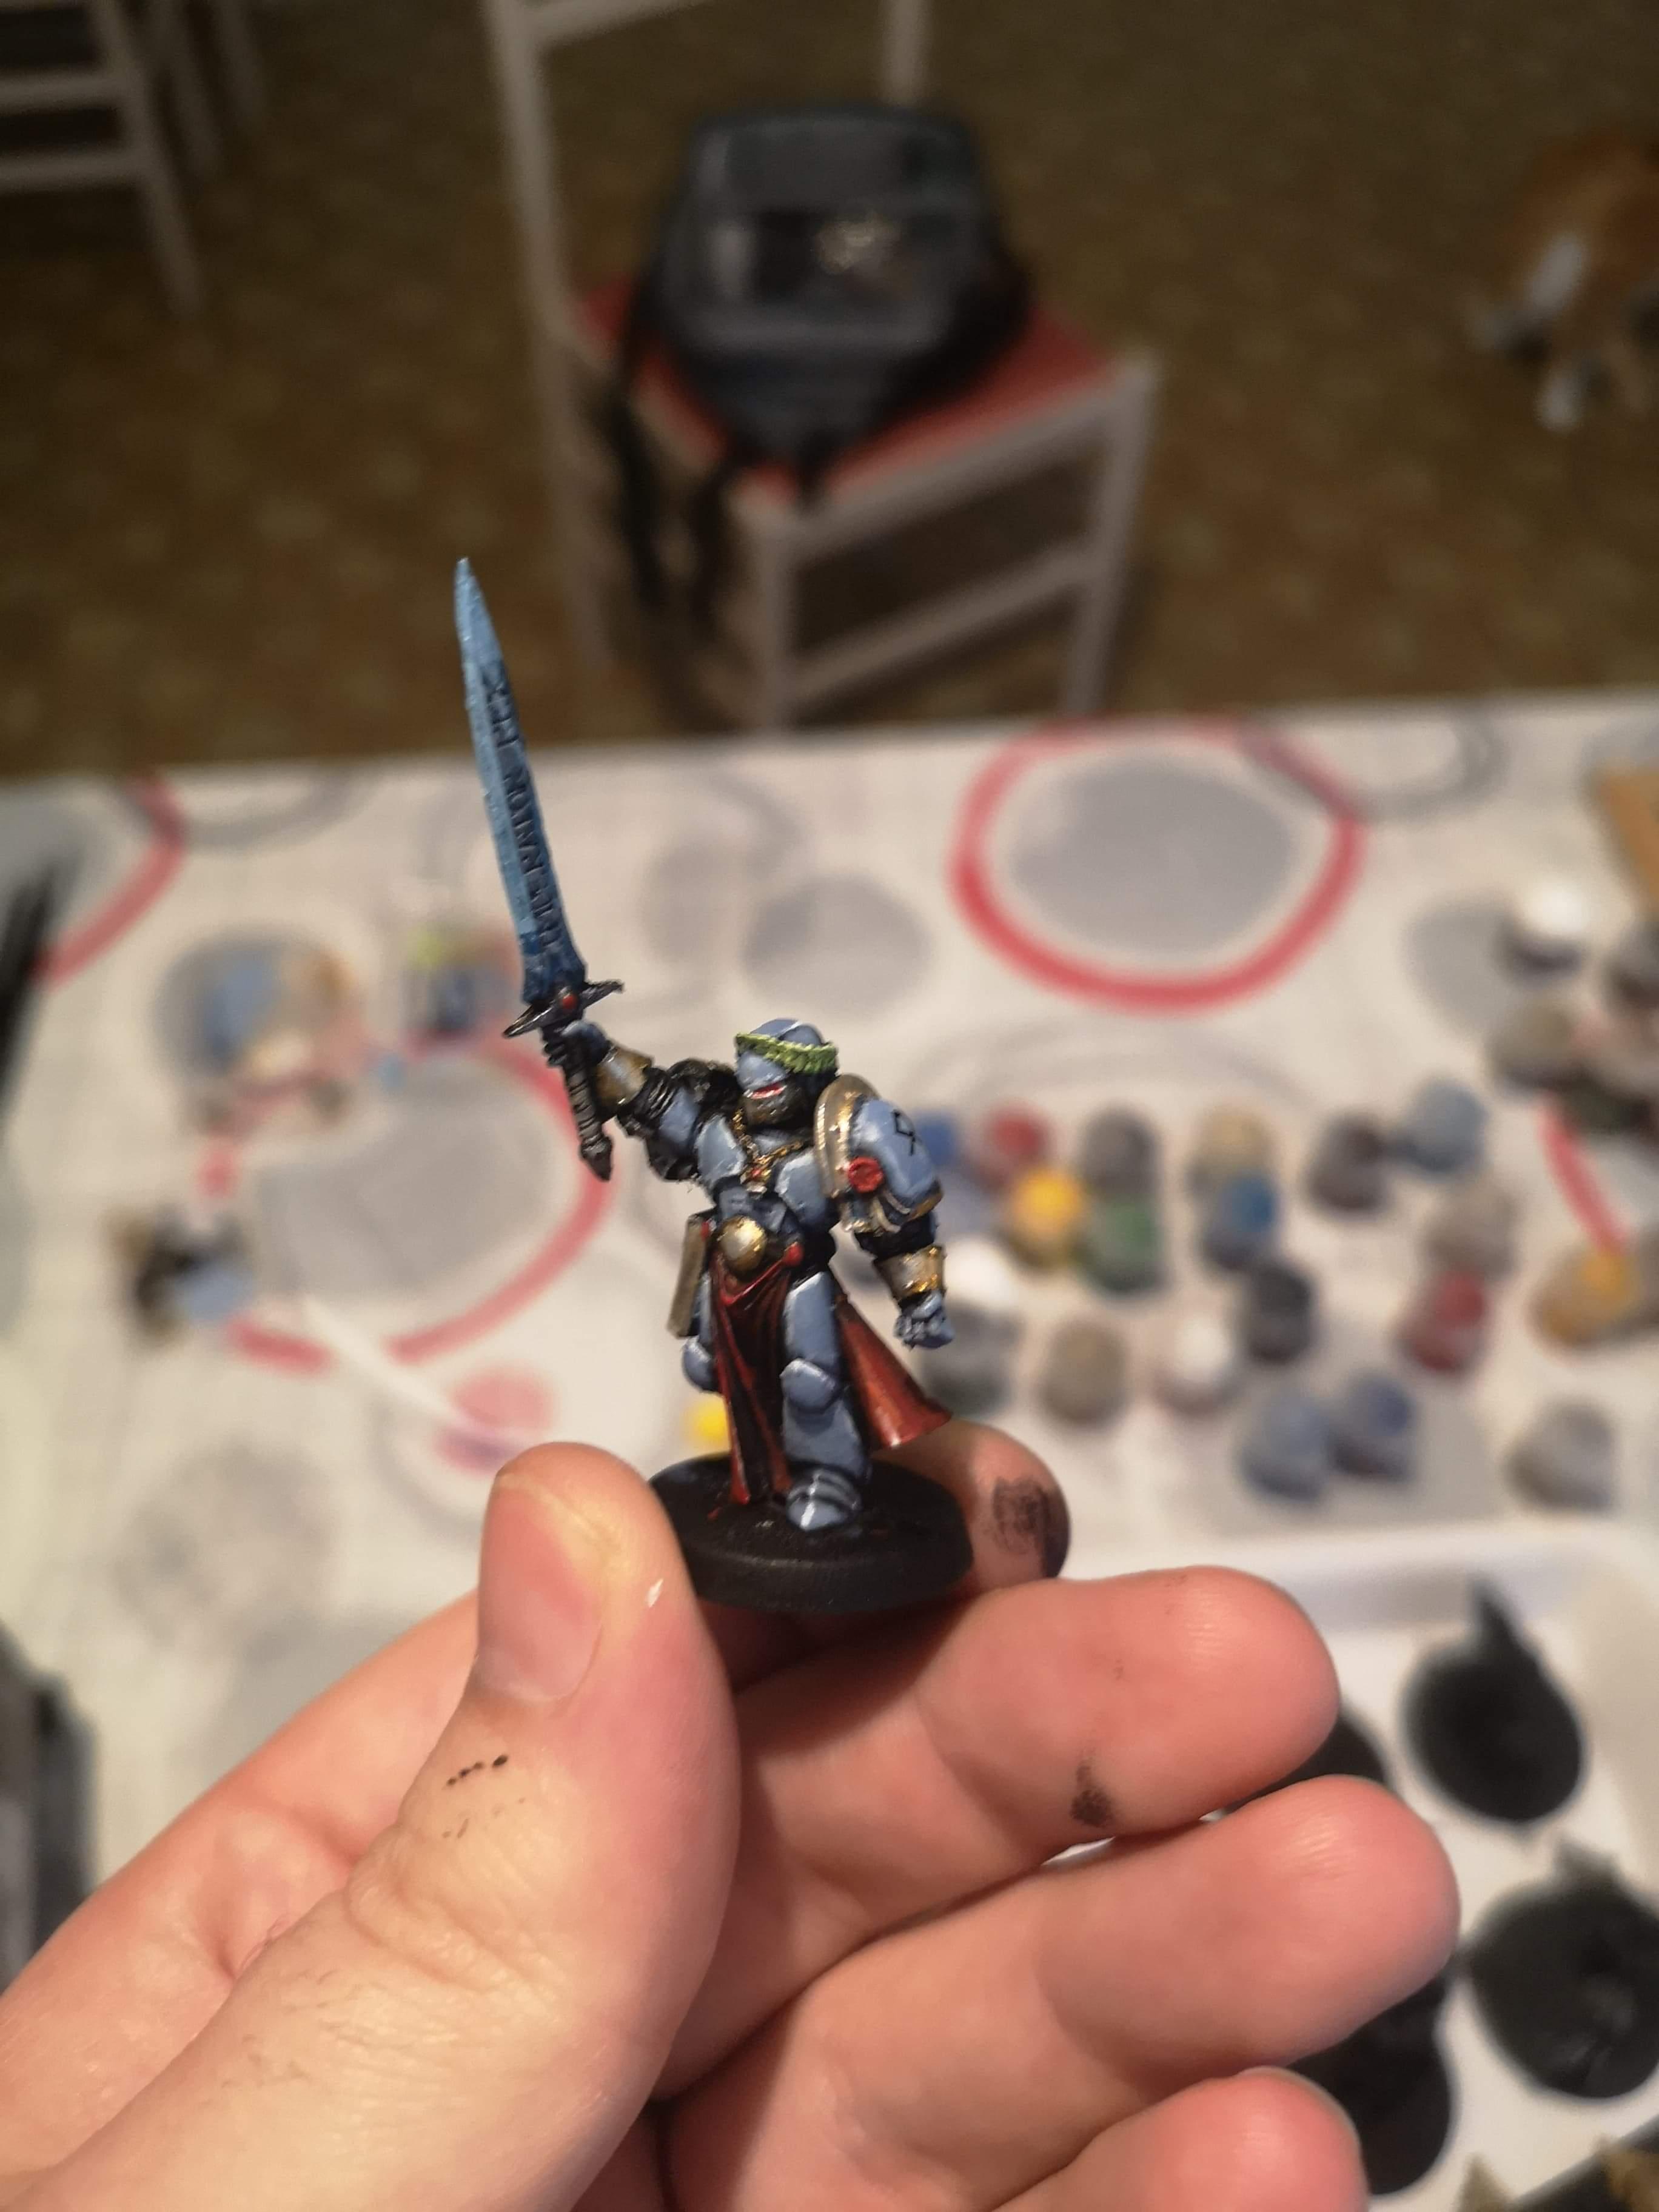 [Peinture] [Warhammer 40,000] Champion de l'empereur Space wolves  Receiv13